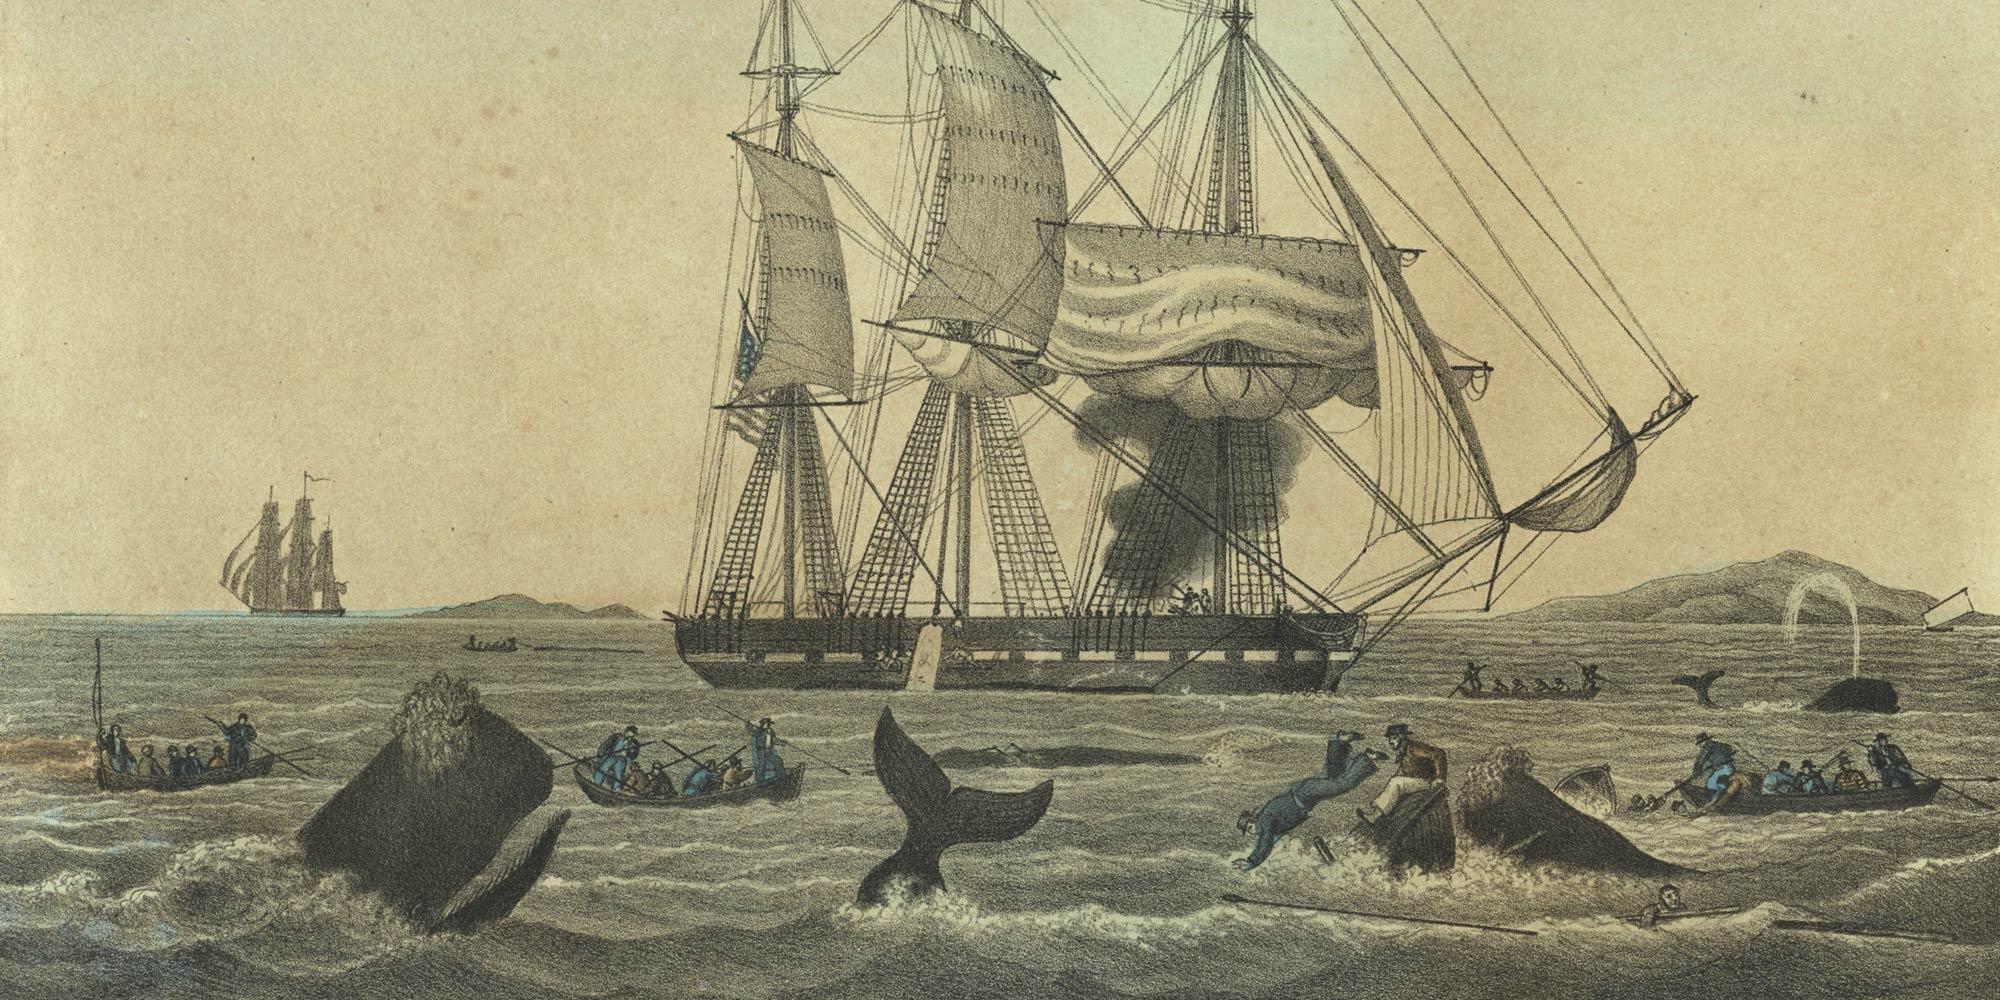 Whaling thumbnail